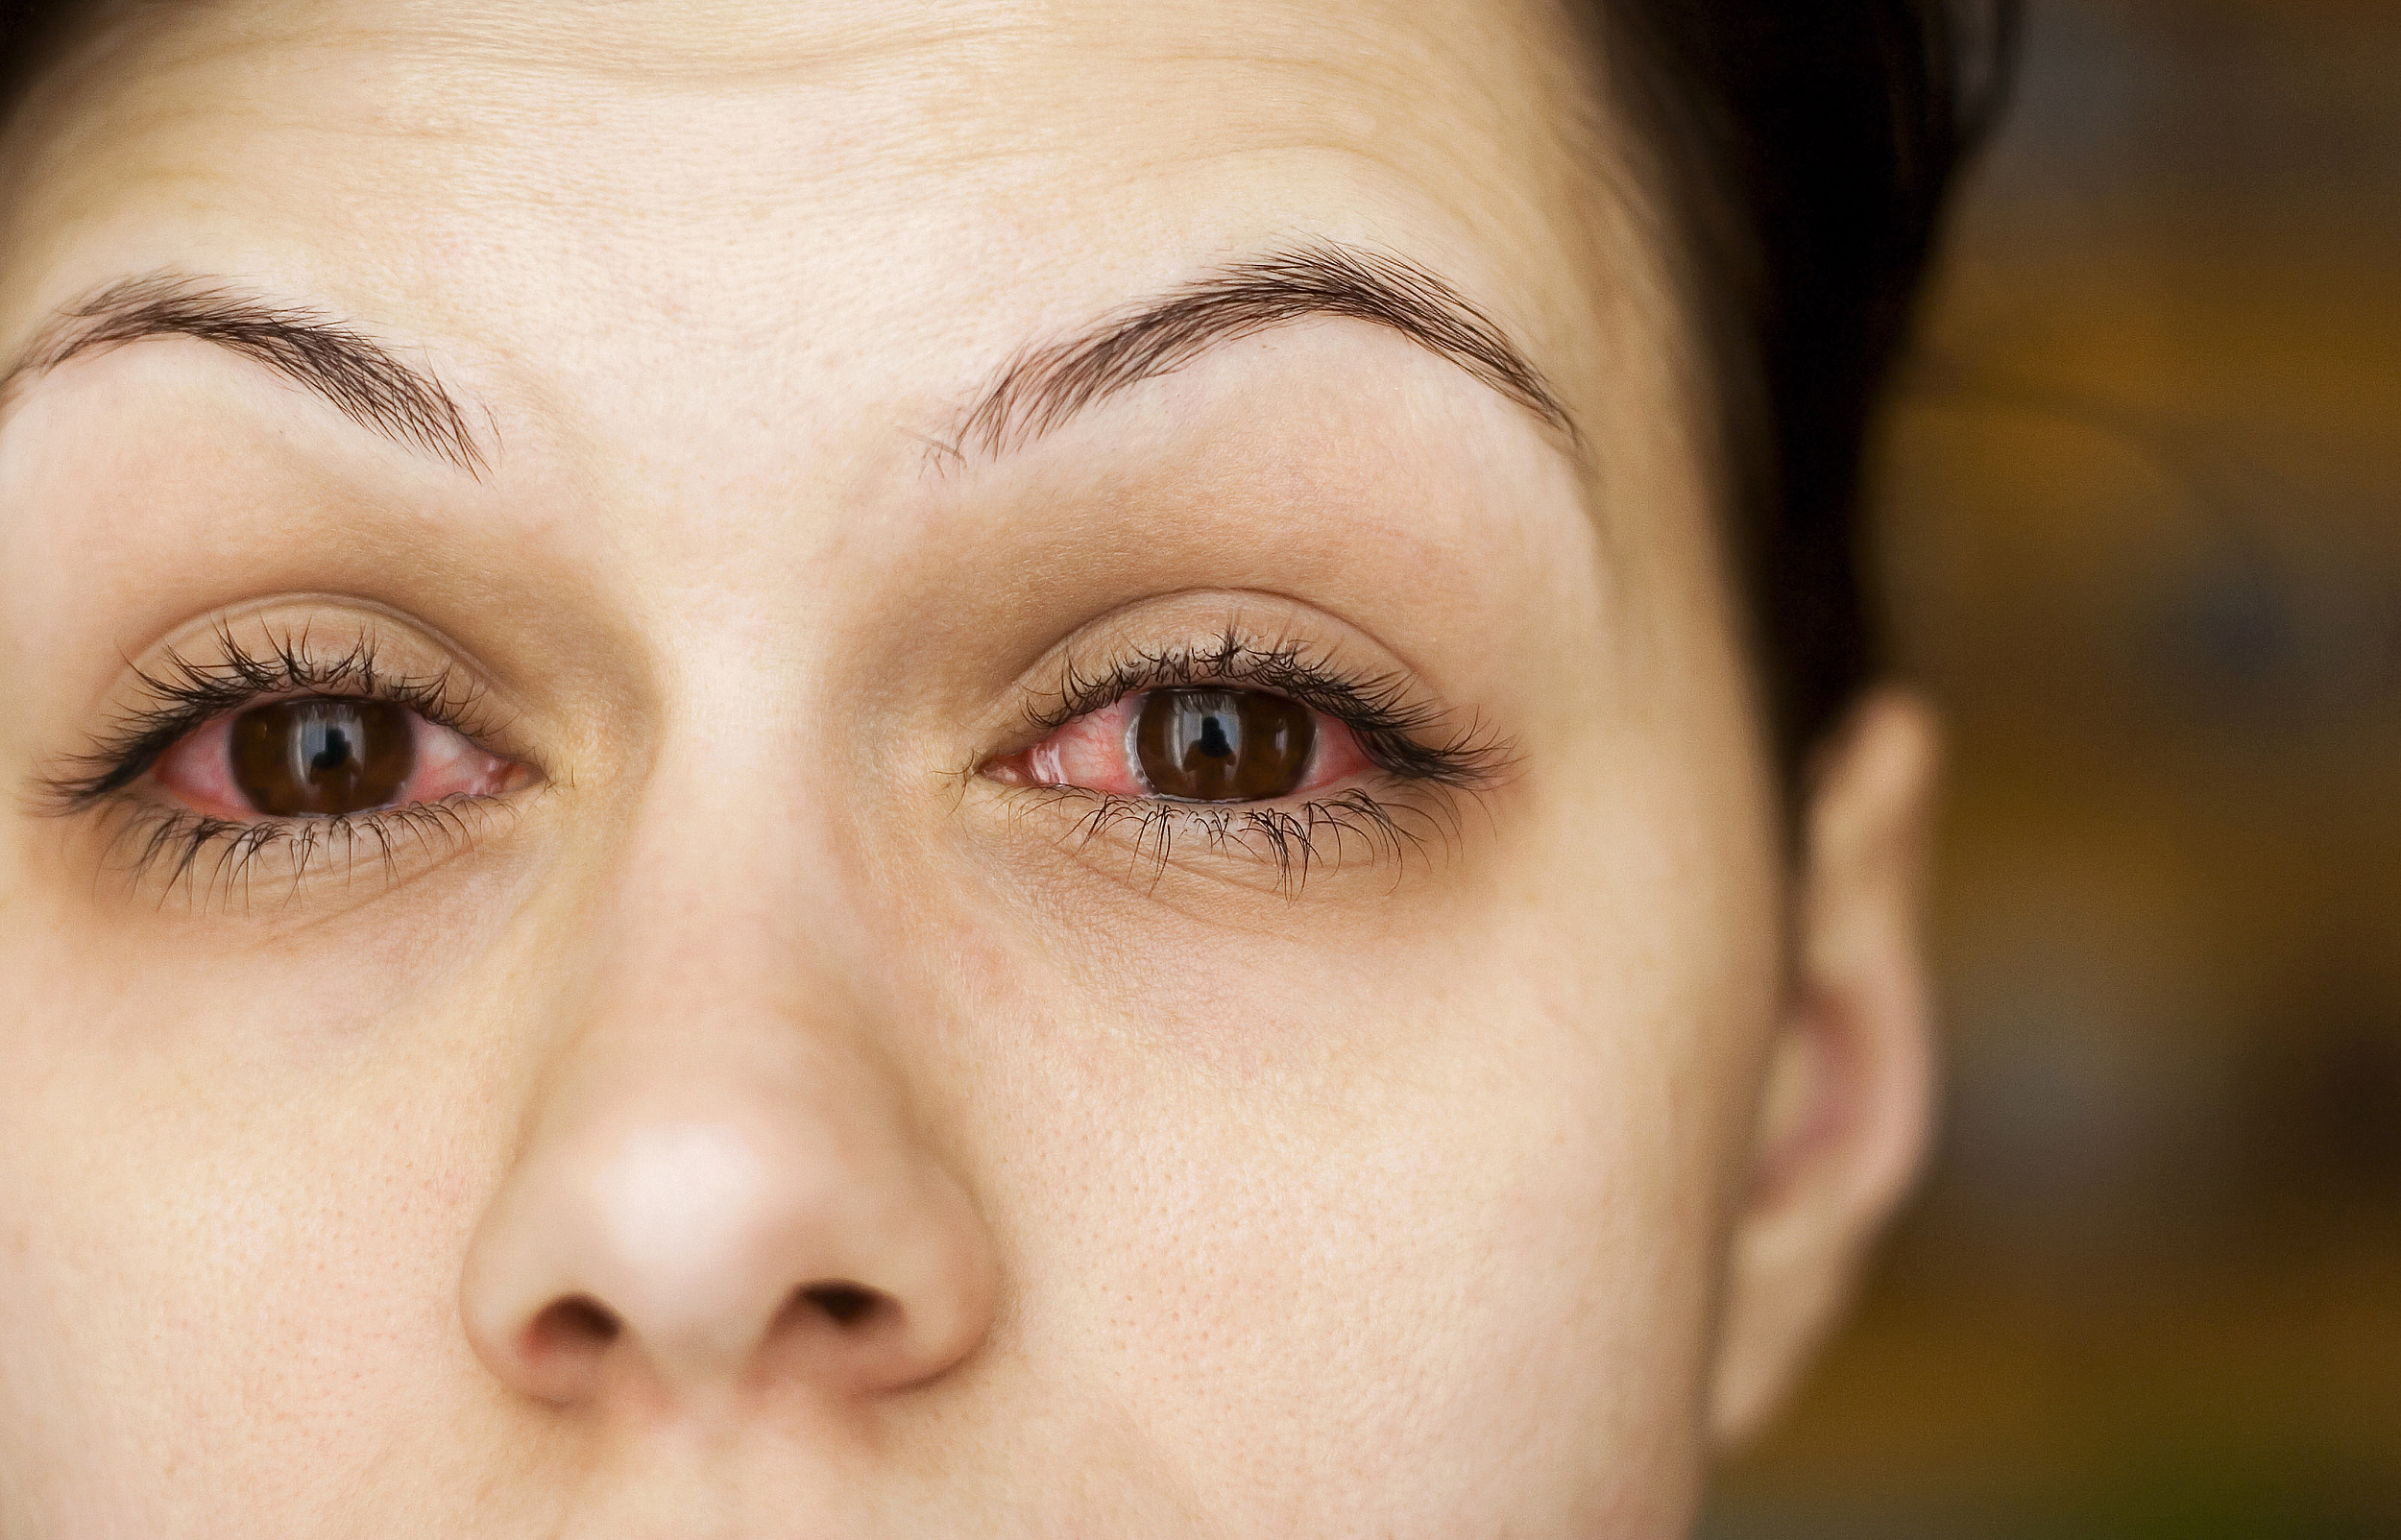 Watch Allergy Relief: Soothing Swollen Eyes video